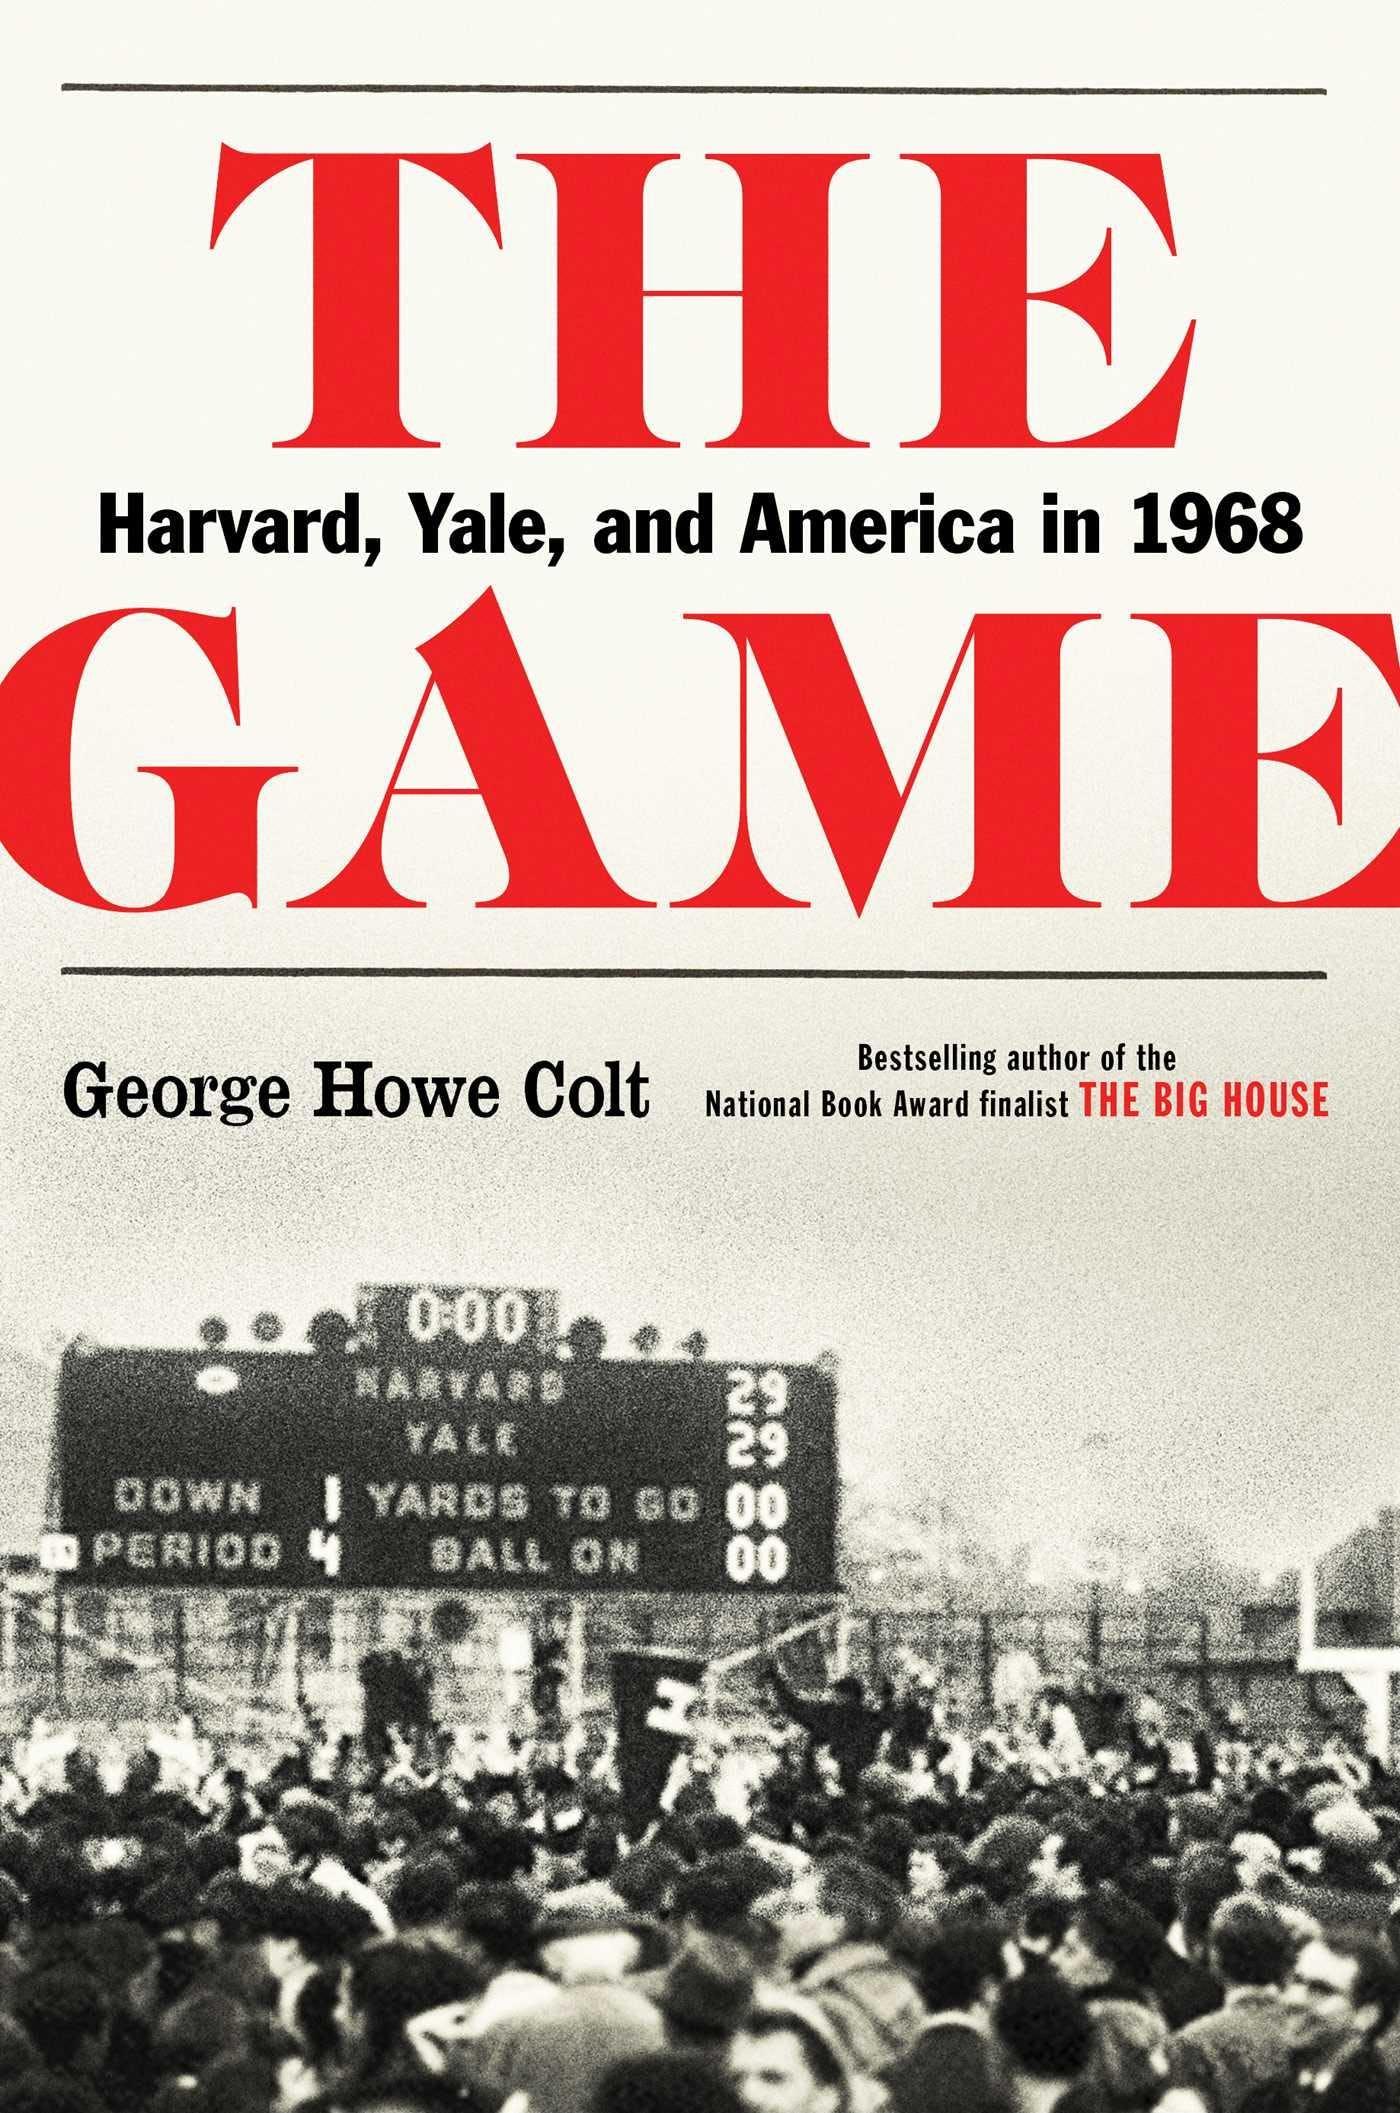 Meet the author George Howe Colt